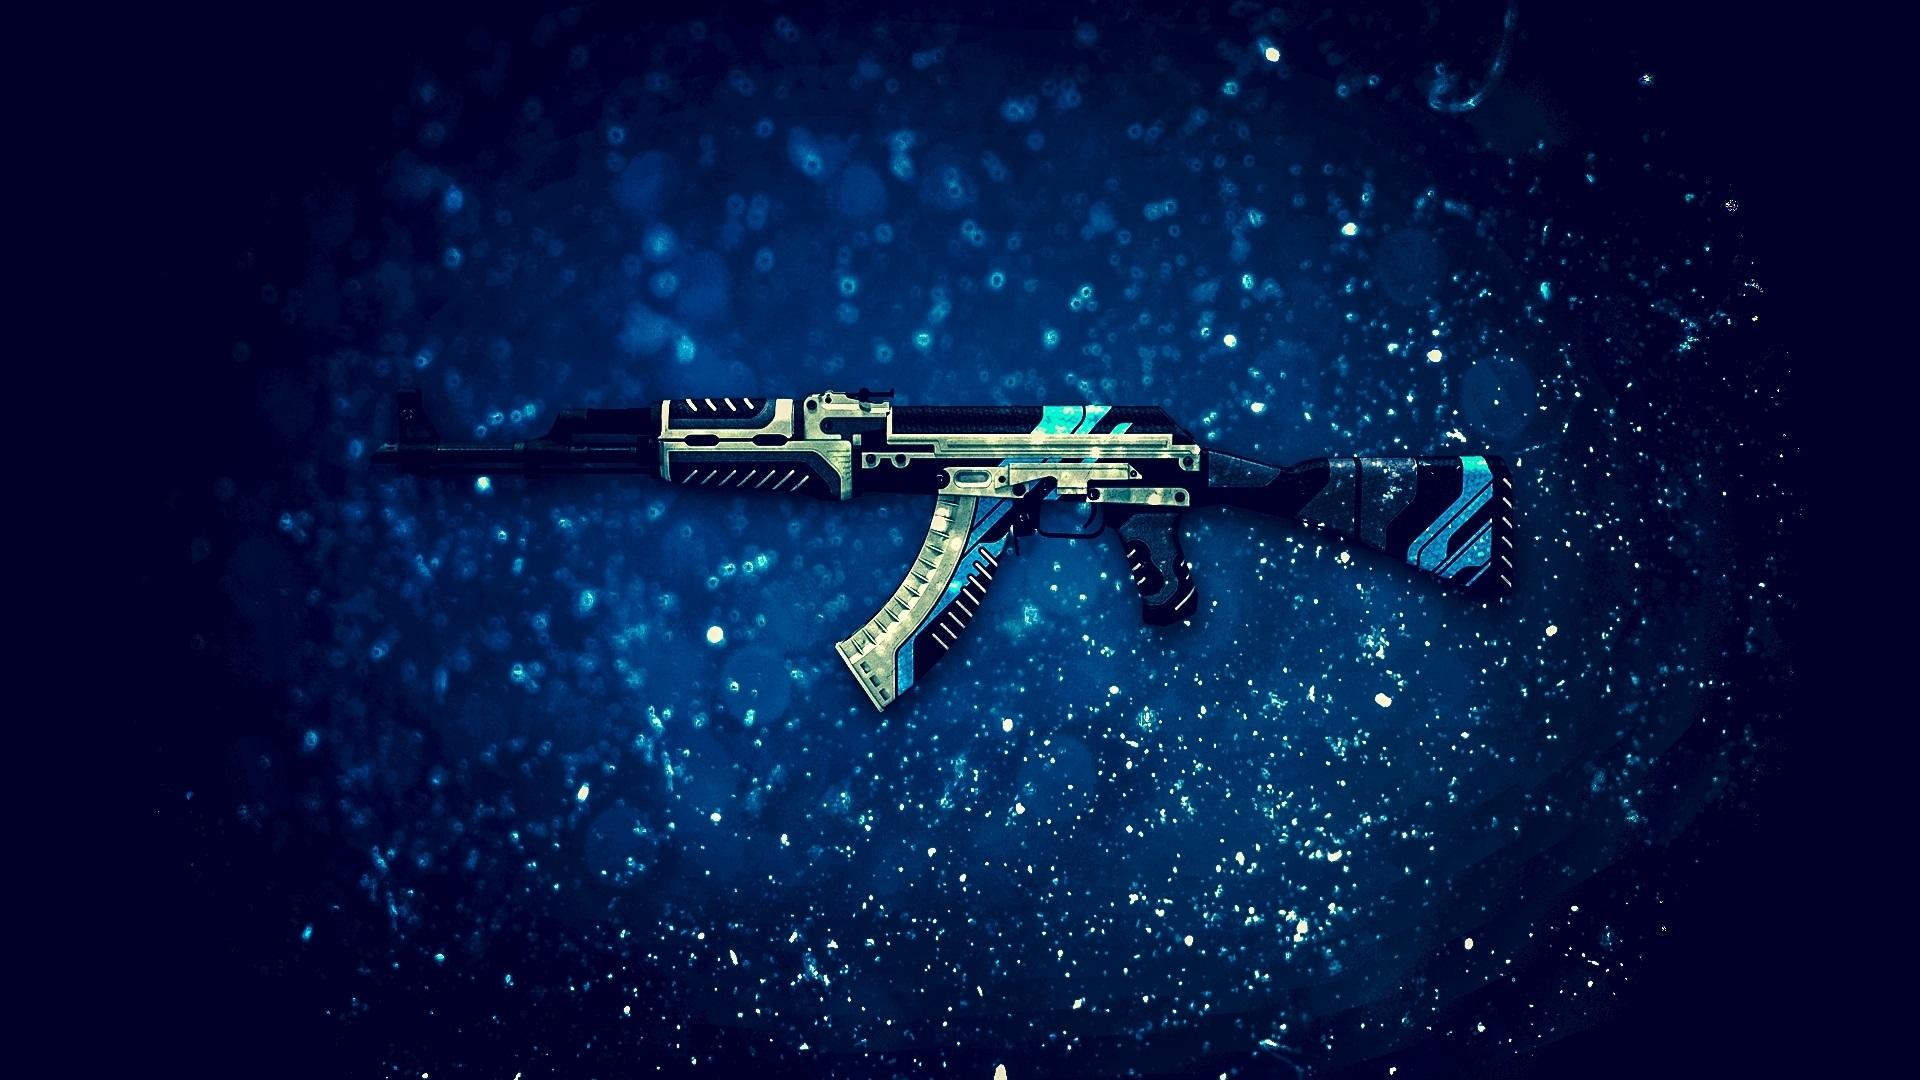 Wallpaper Ak 47 Assault Rifle Cs Go Pc Game 1920x1200 Hd Picture